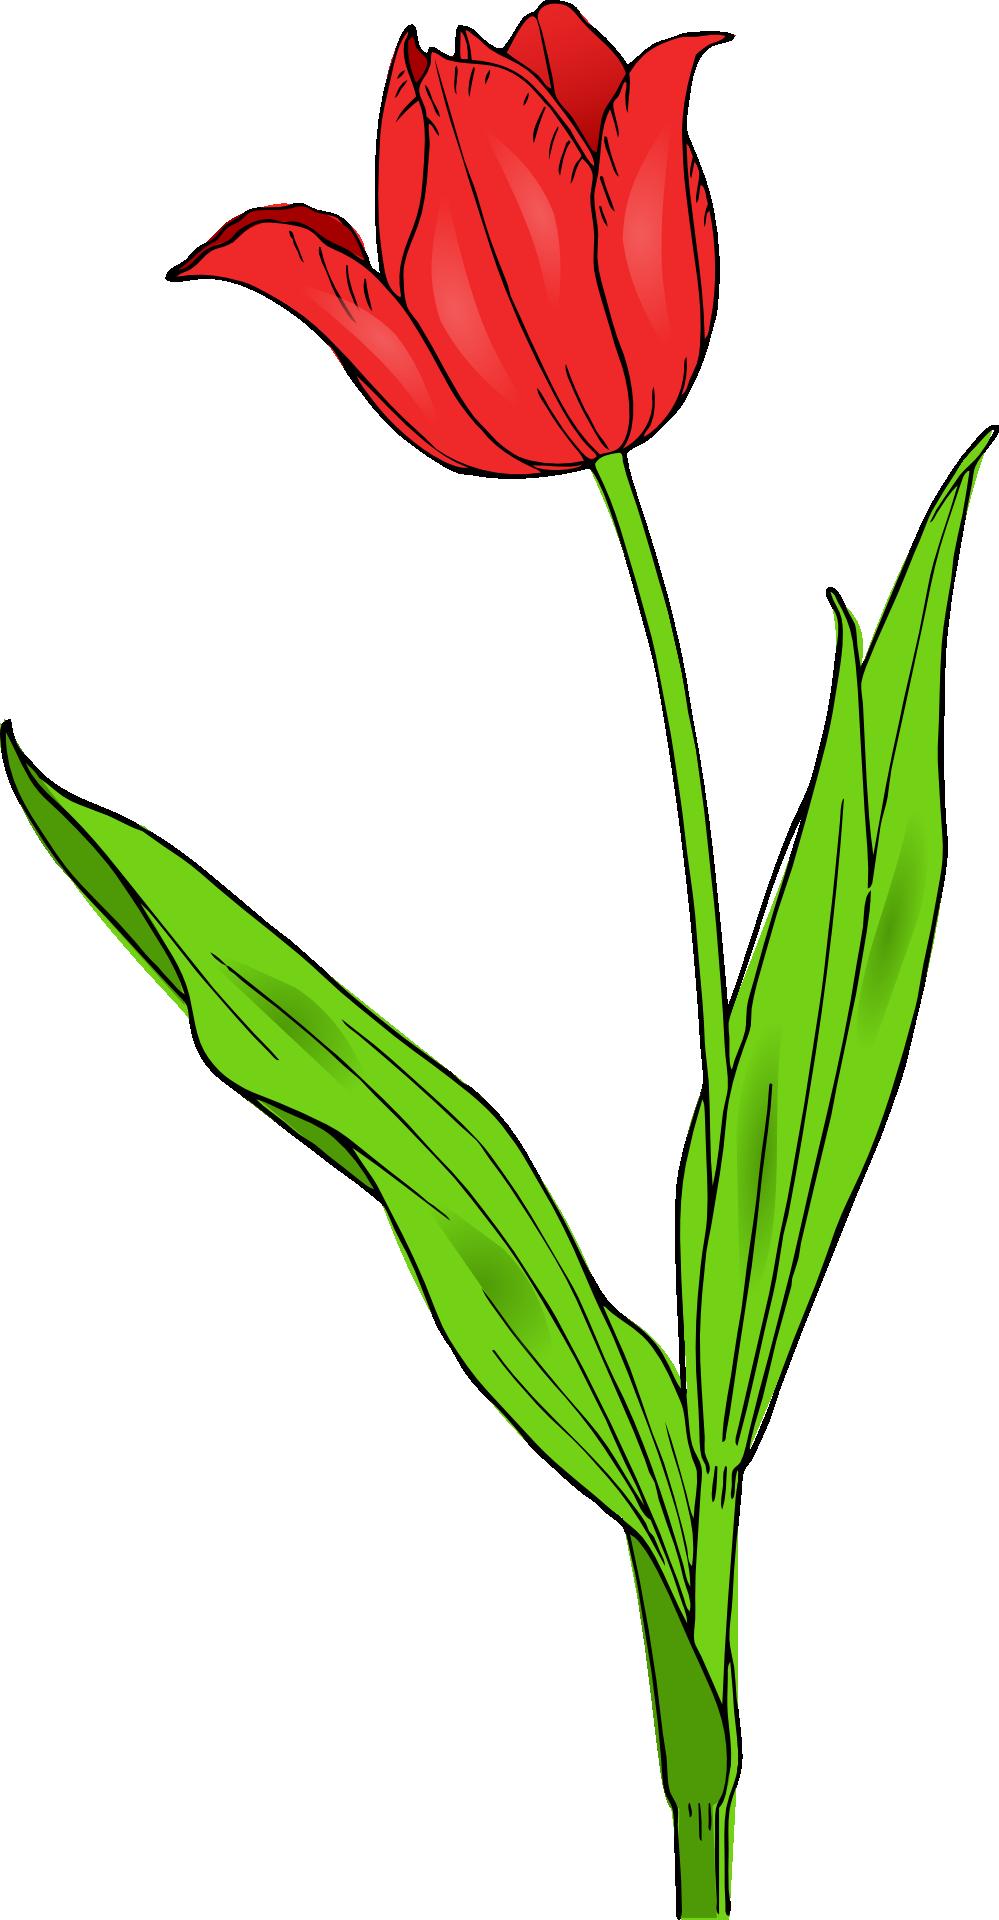 Flowers clipart tulip. Flower clip art free